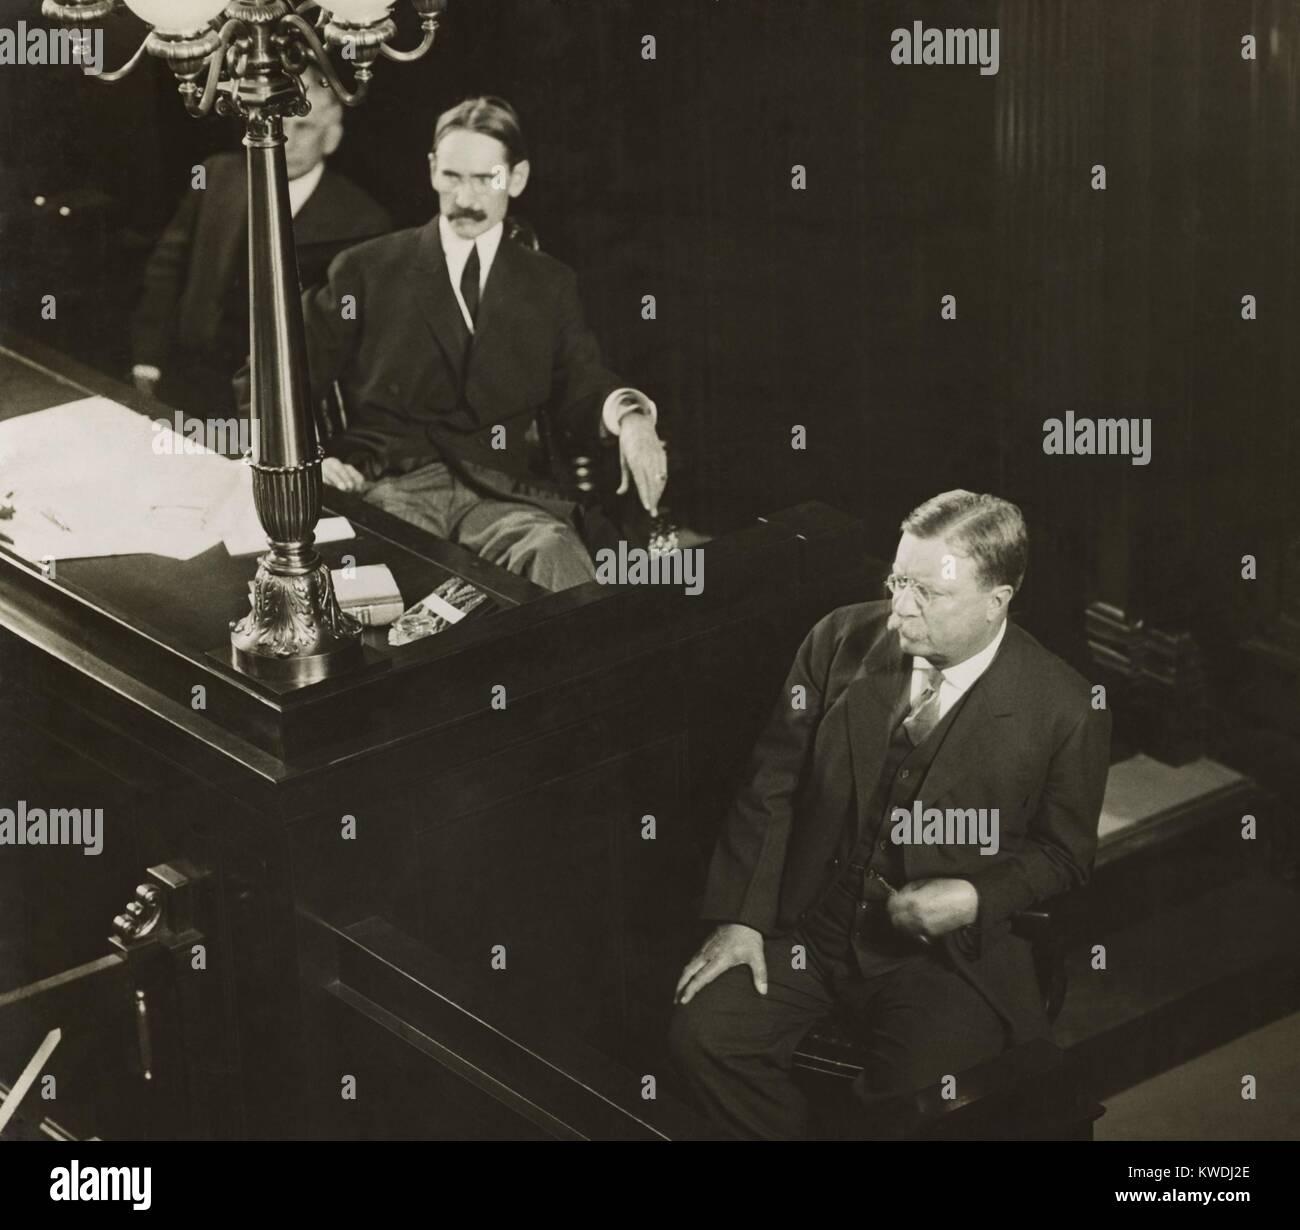 Oberst Theodore Roosevelt, April 1917 vom renommierten Fotografen, Pirie MacDonald. (BSLOC_2017_8_72) Stockbild